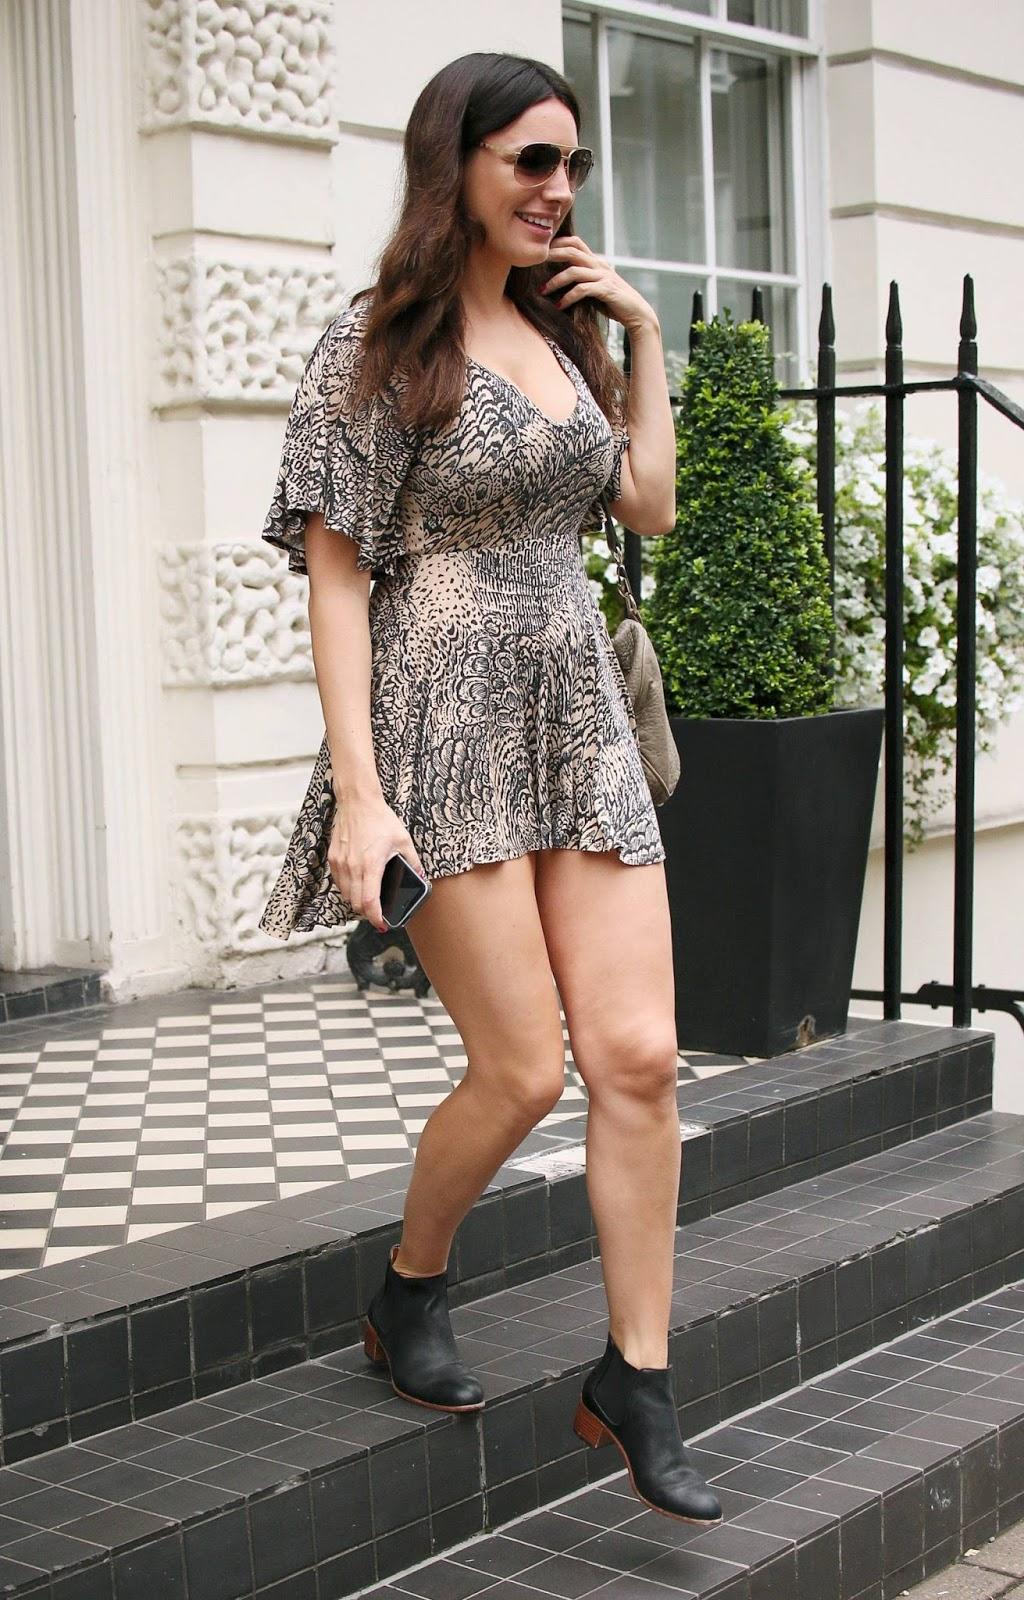 Kelly Brook Upskirt Candids in London - Fashion Style